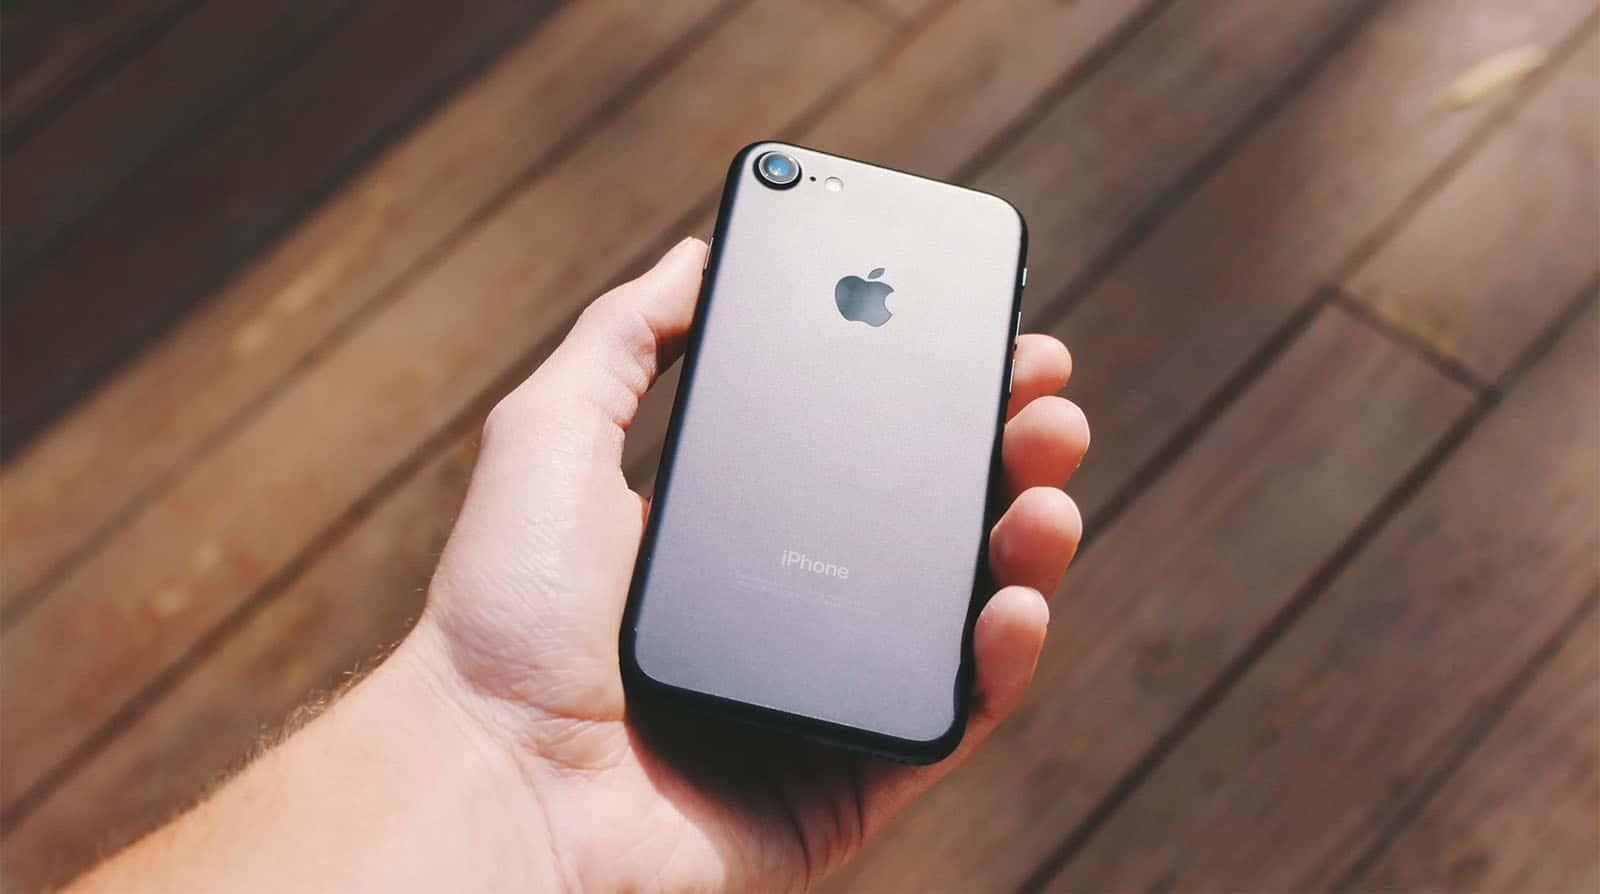 iPhone SE 2020, Dxomark'da Ses Kalitesi Rekoru